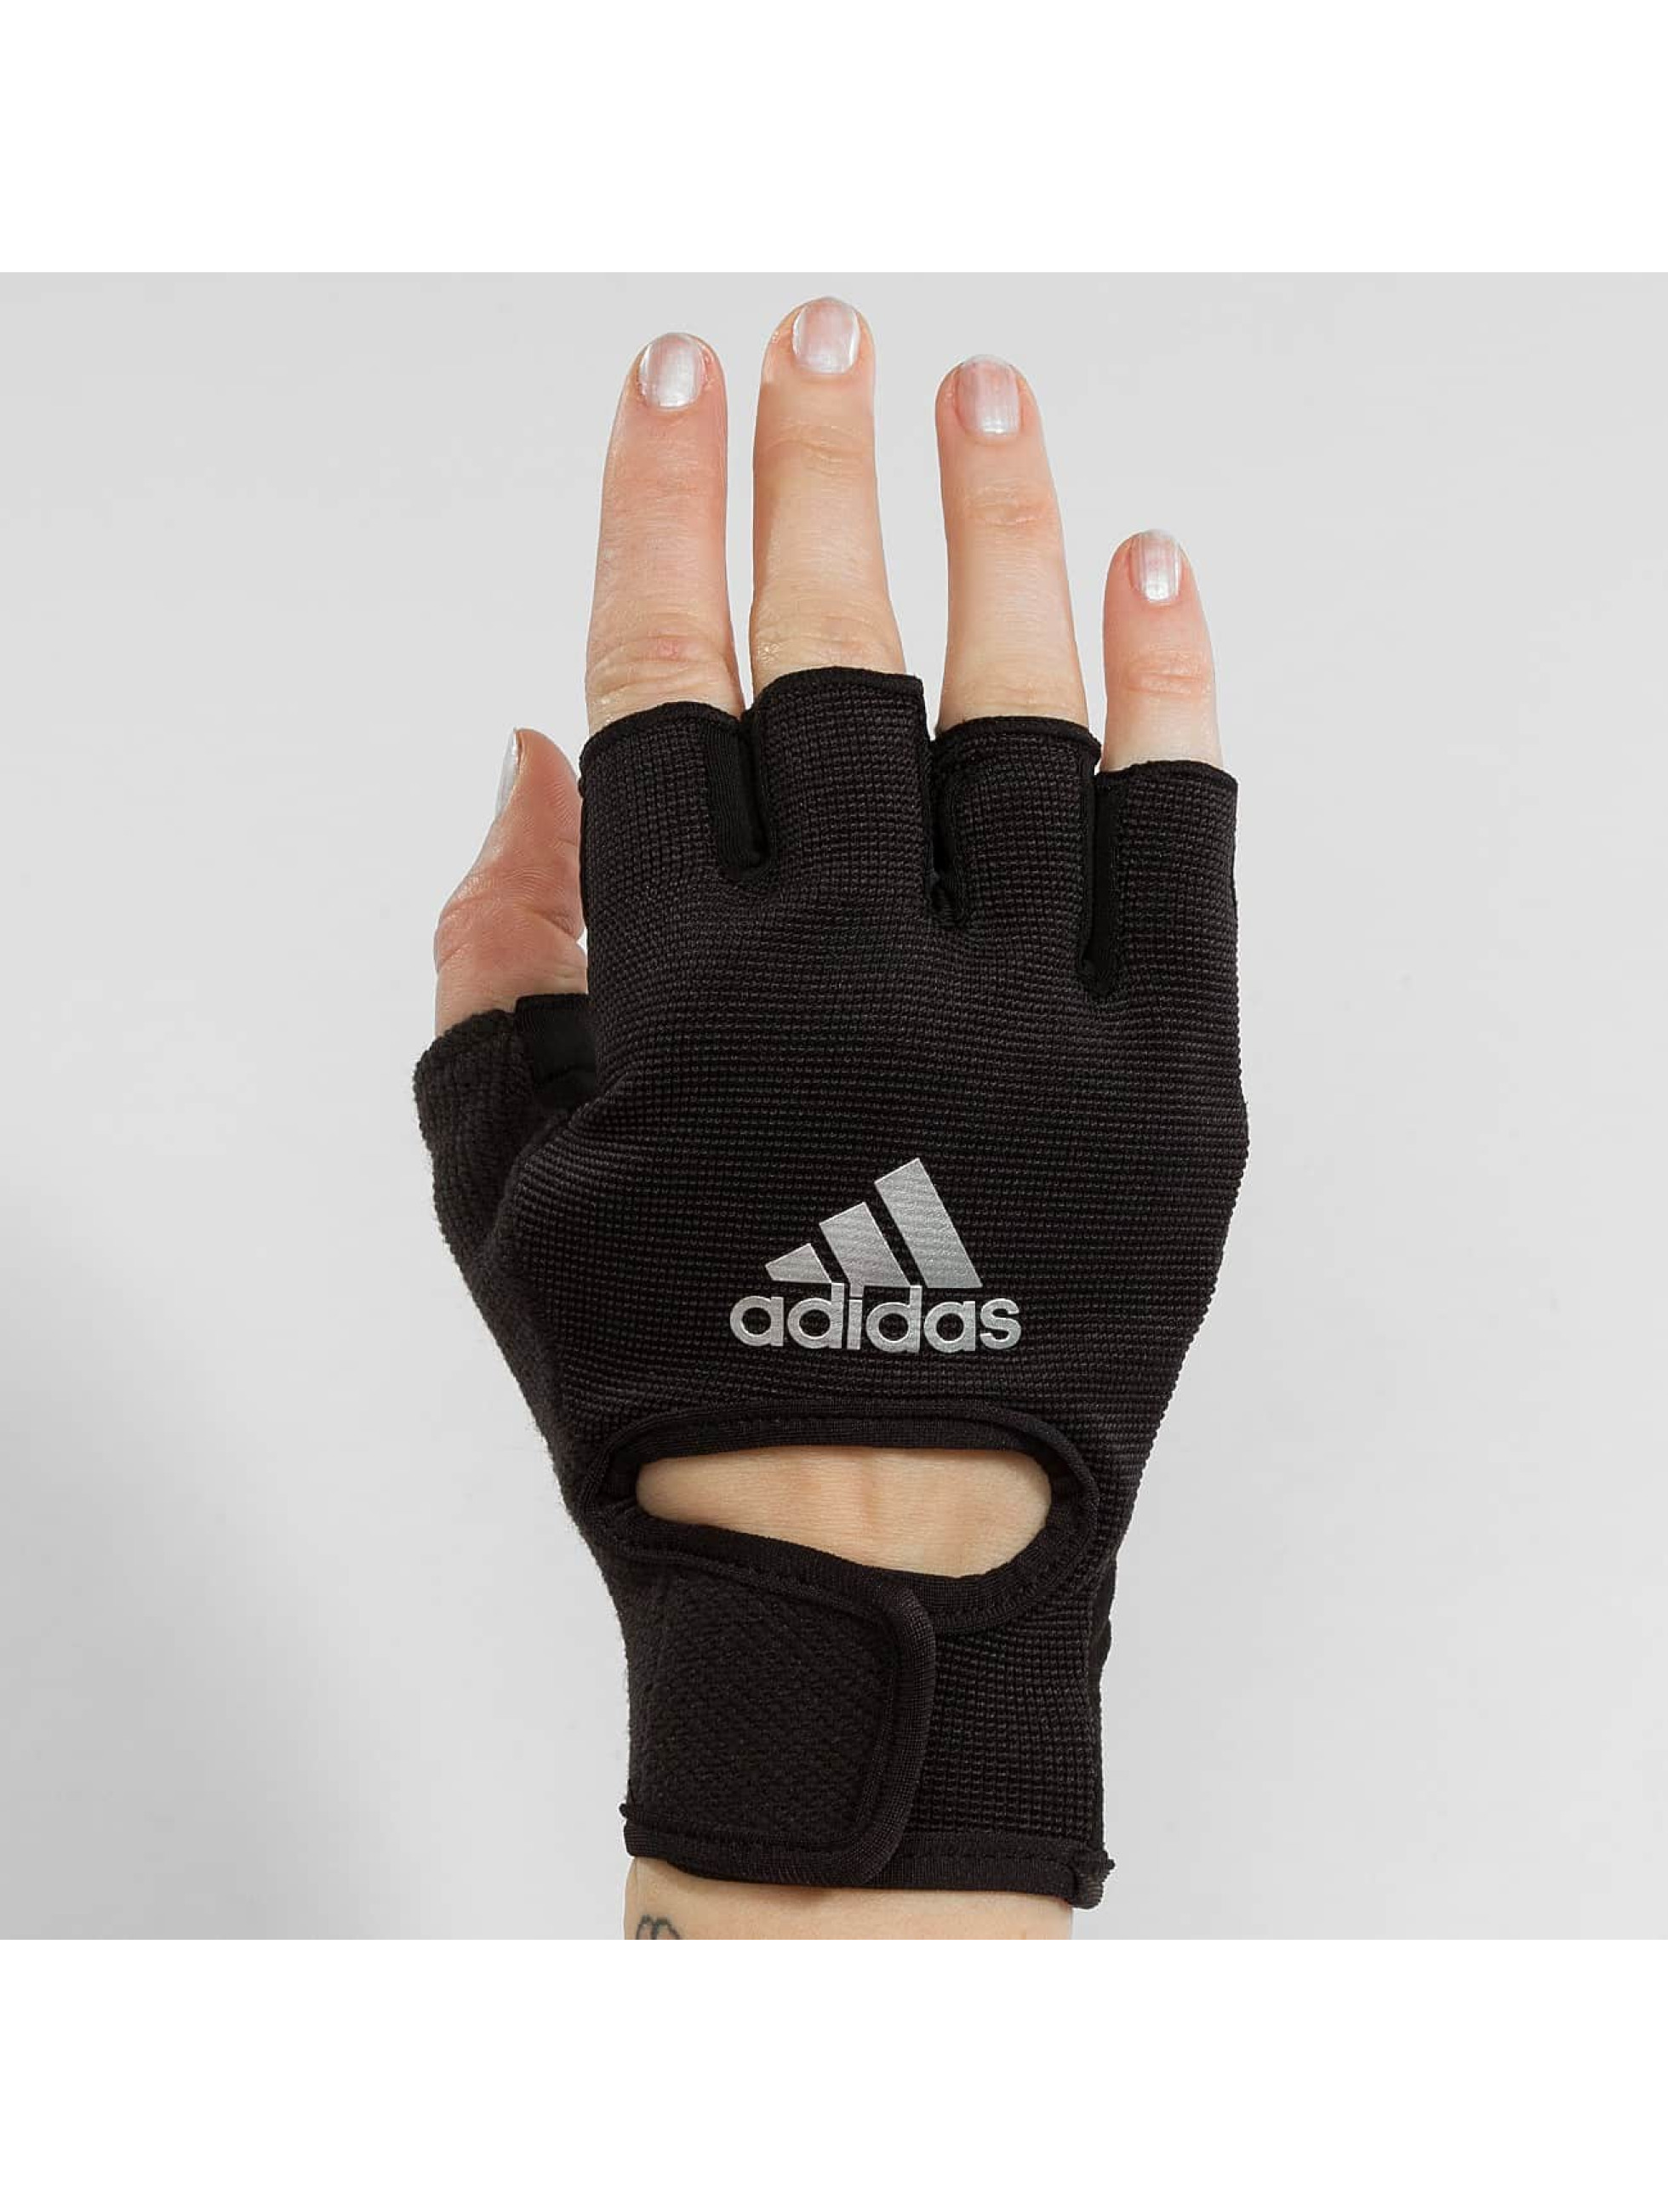 adidas Performance Gants Performance Climalite Versatile noir